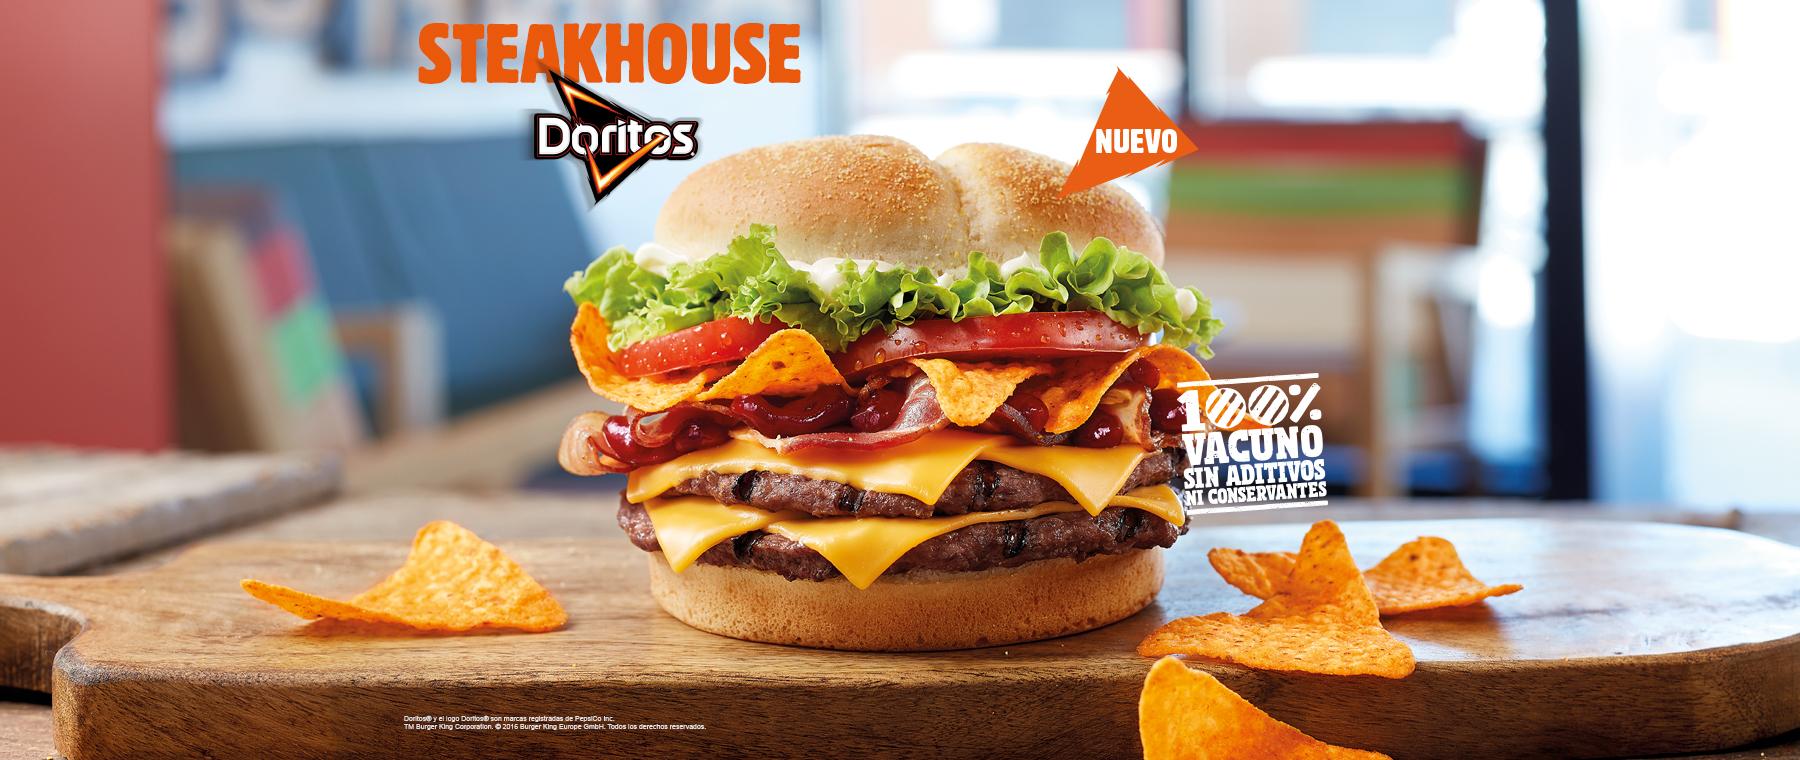 Burger King lance le Steakhouse Doritos, le burger ultime